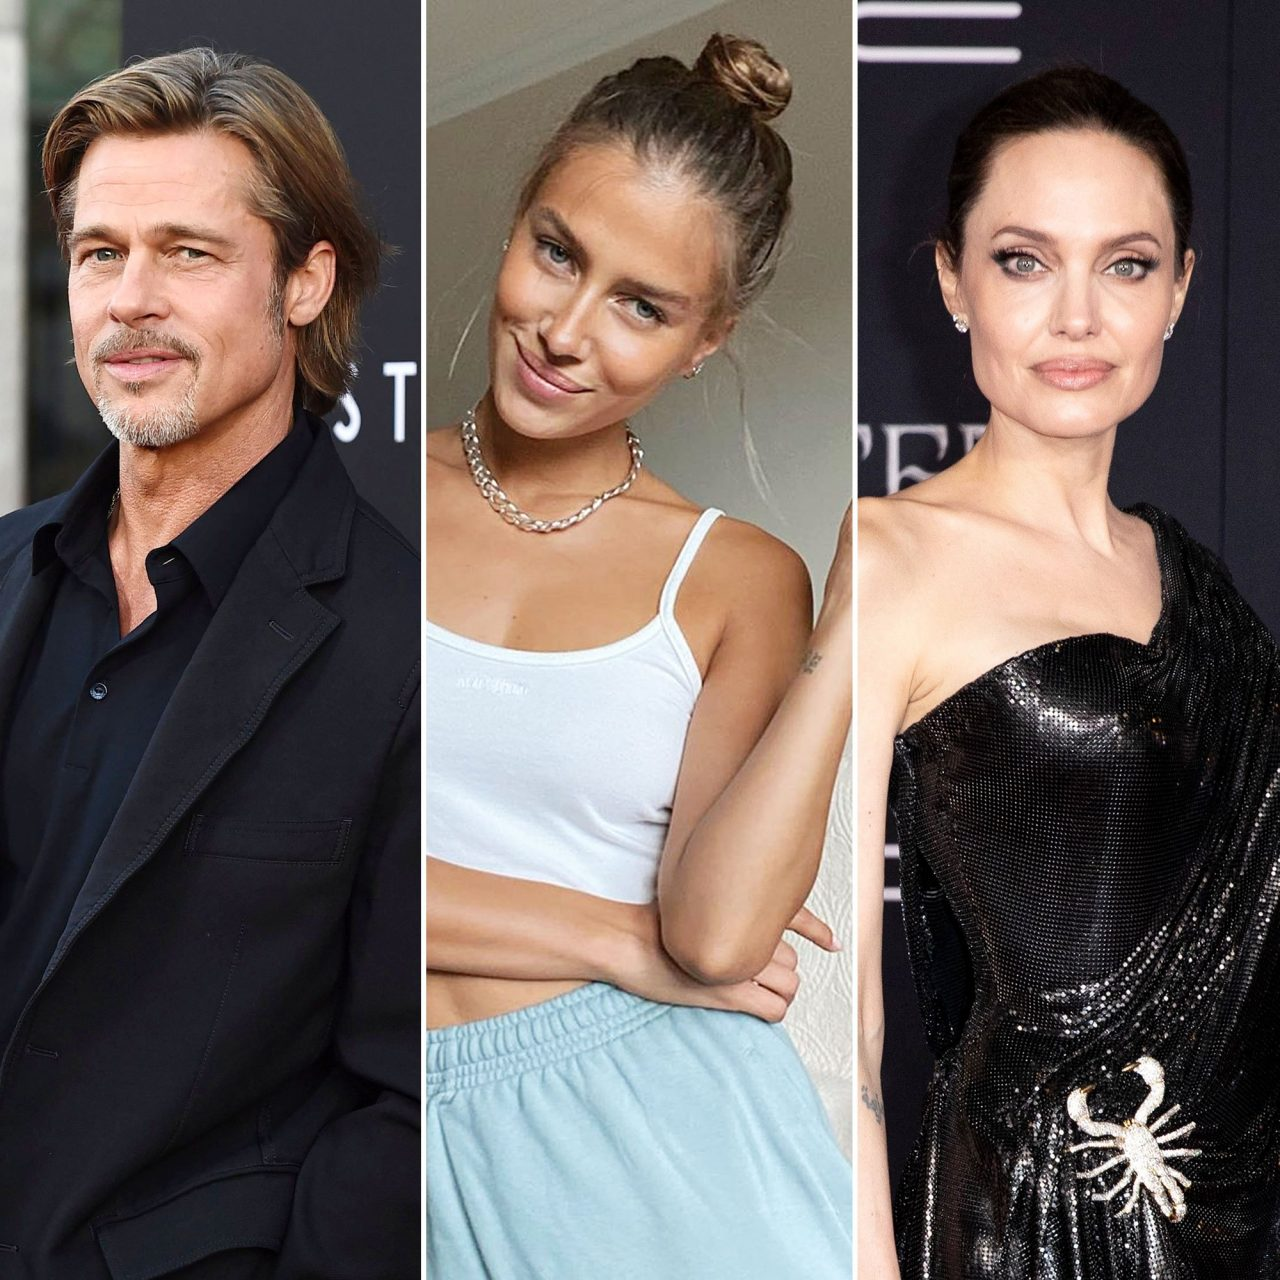 Brad-Pitt-Is-Dating-German-Model-Nicole-Poturalski-Amid-Angelina-Jolie-Divorce-02